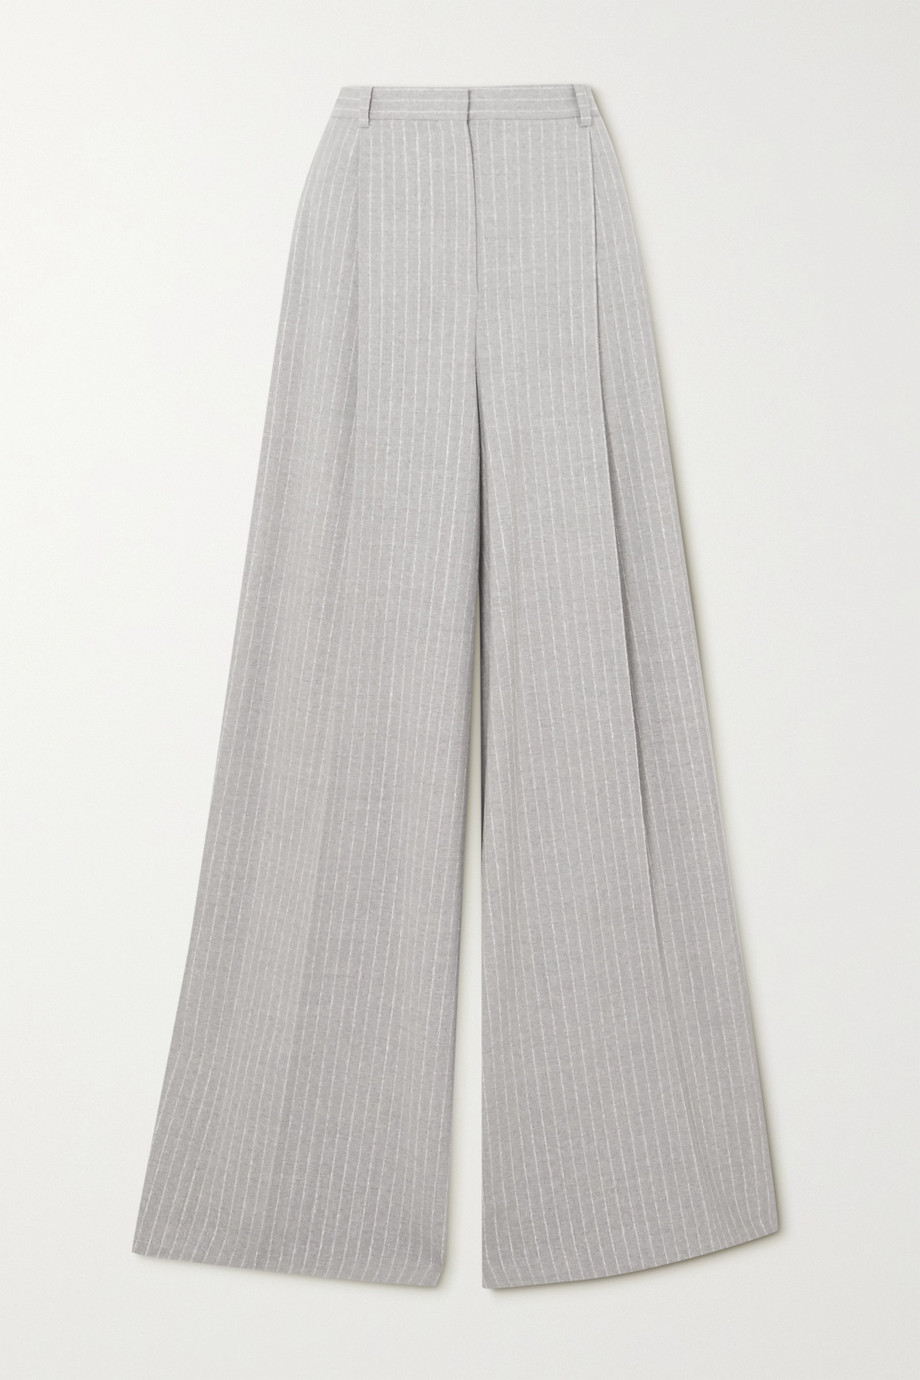 Nina Ricci Pantalon large en laine stretch à fines rayures